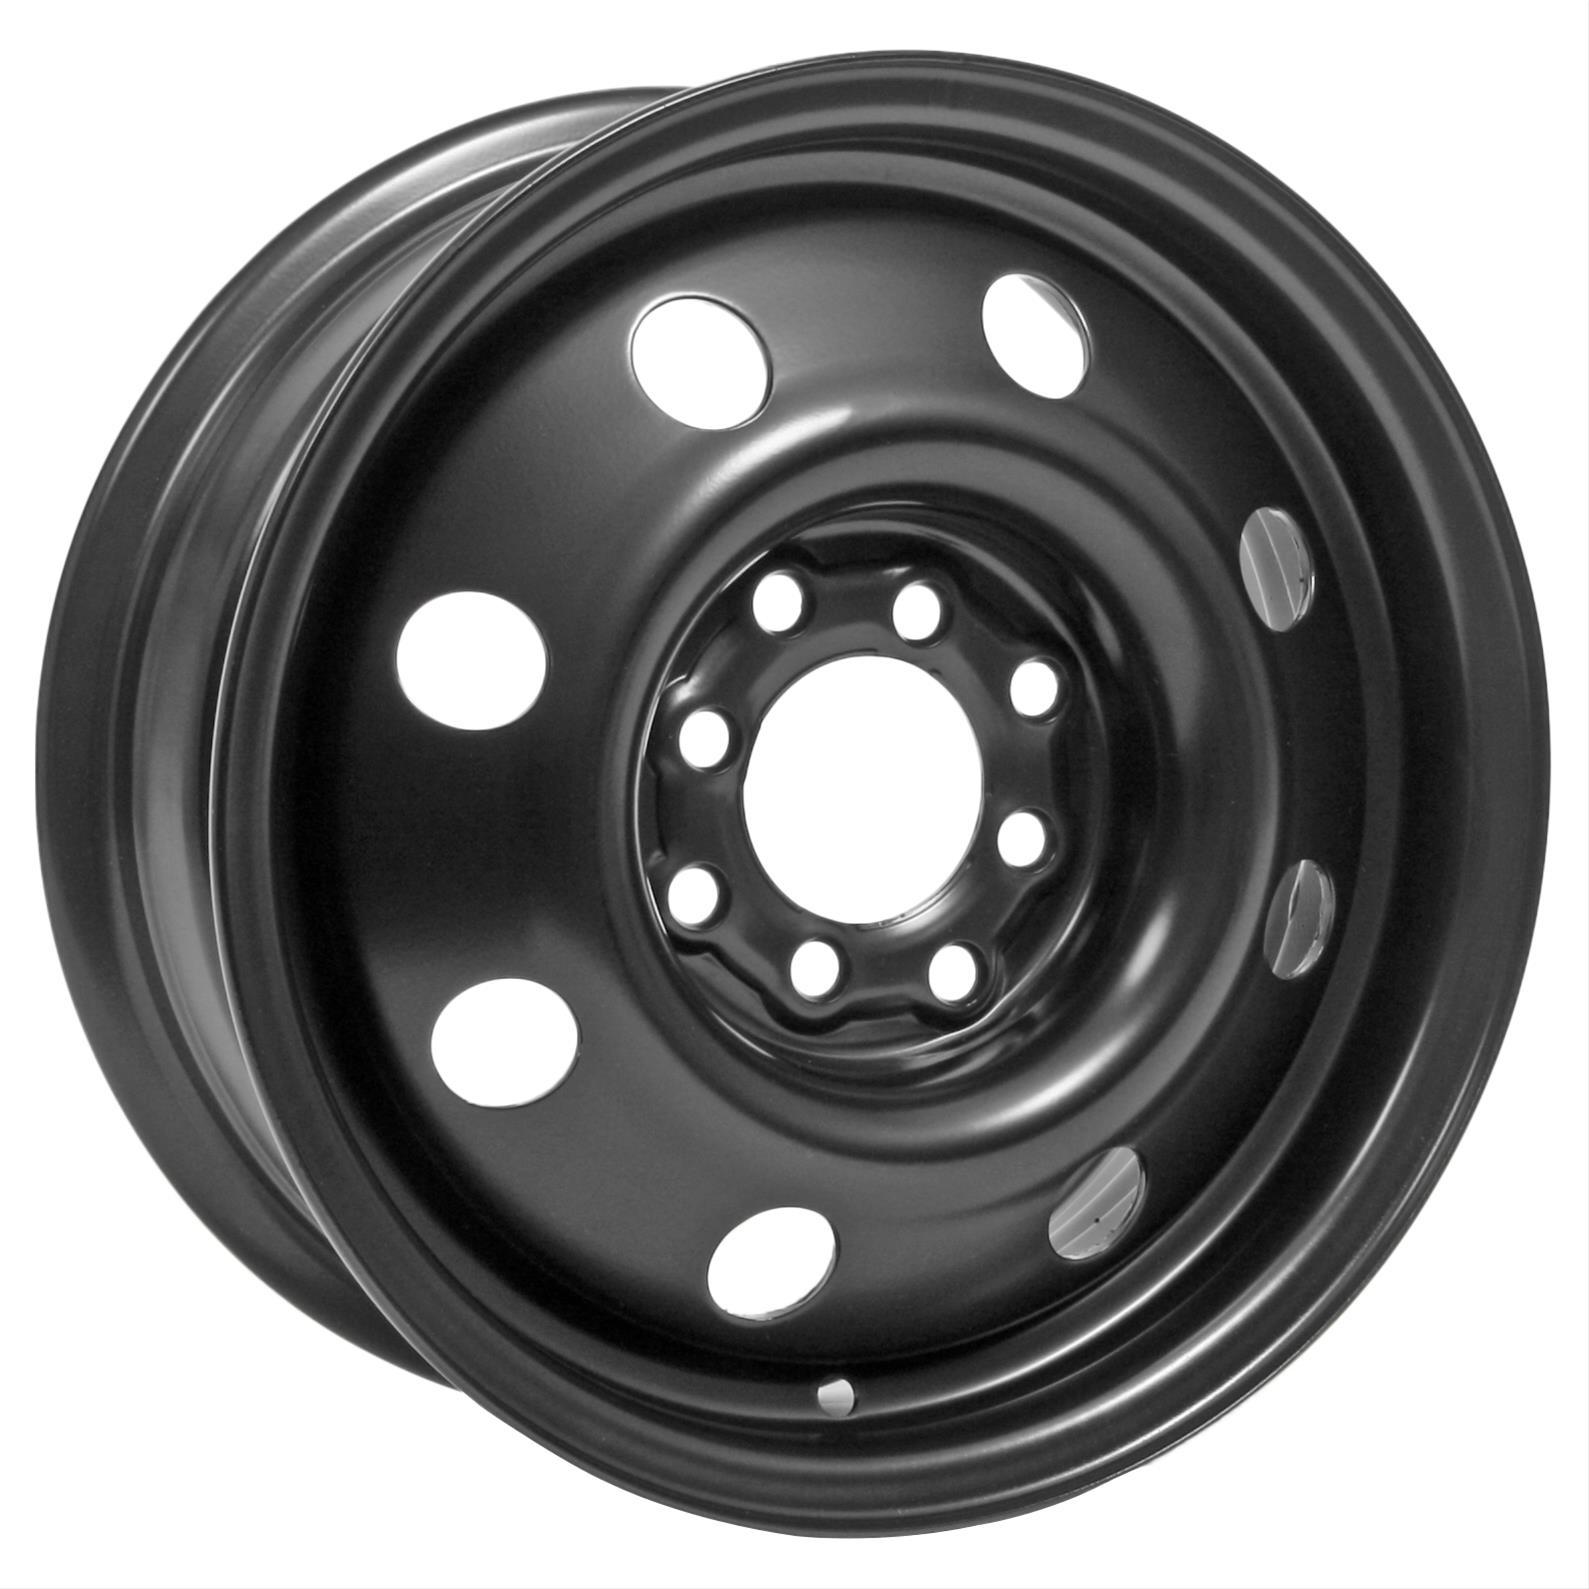 "Unique Series 83 Black Steel Wheels 14""x5.5"" 4x100mm BC ..."